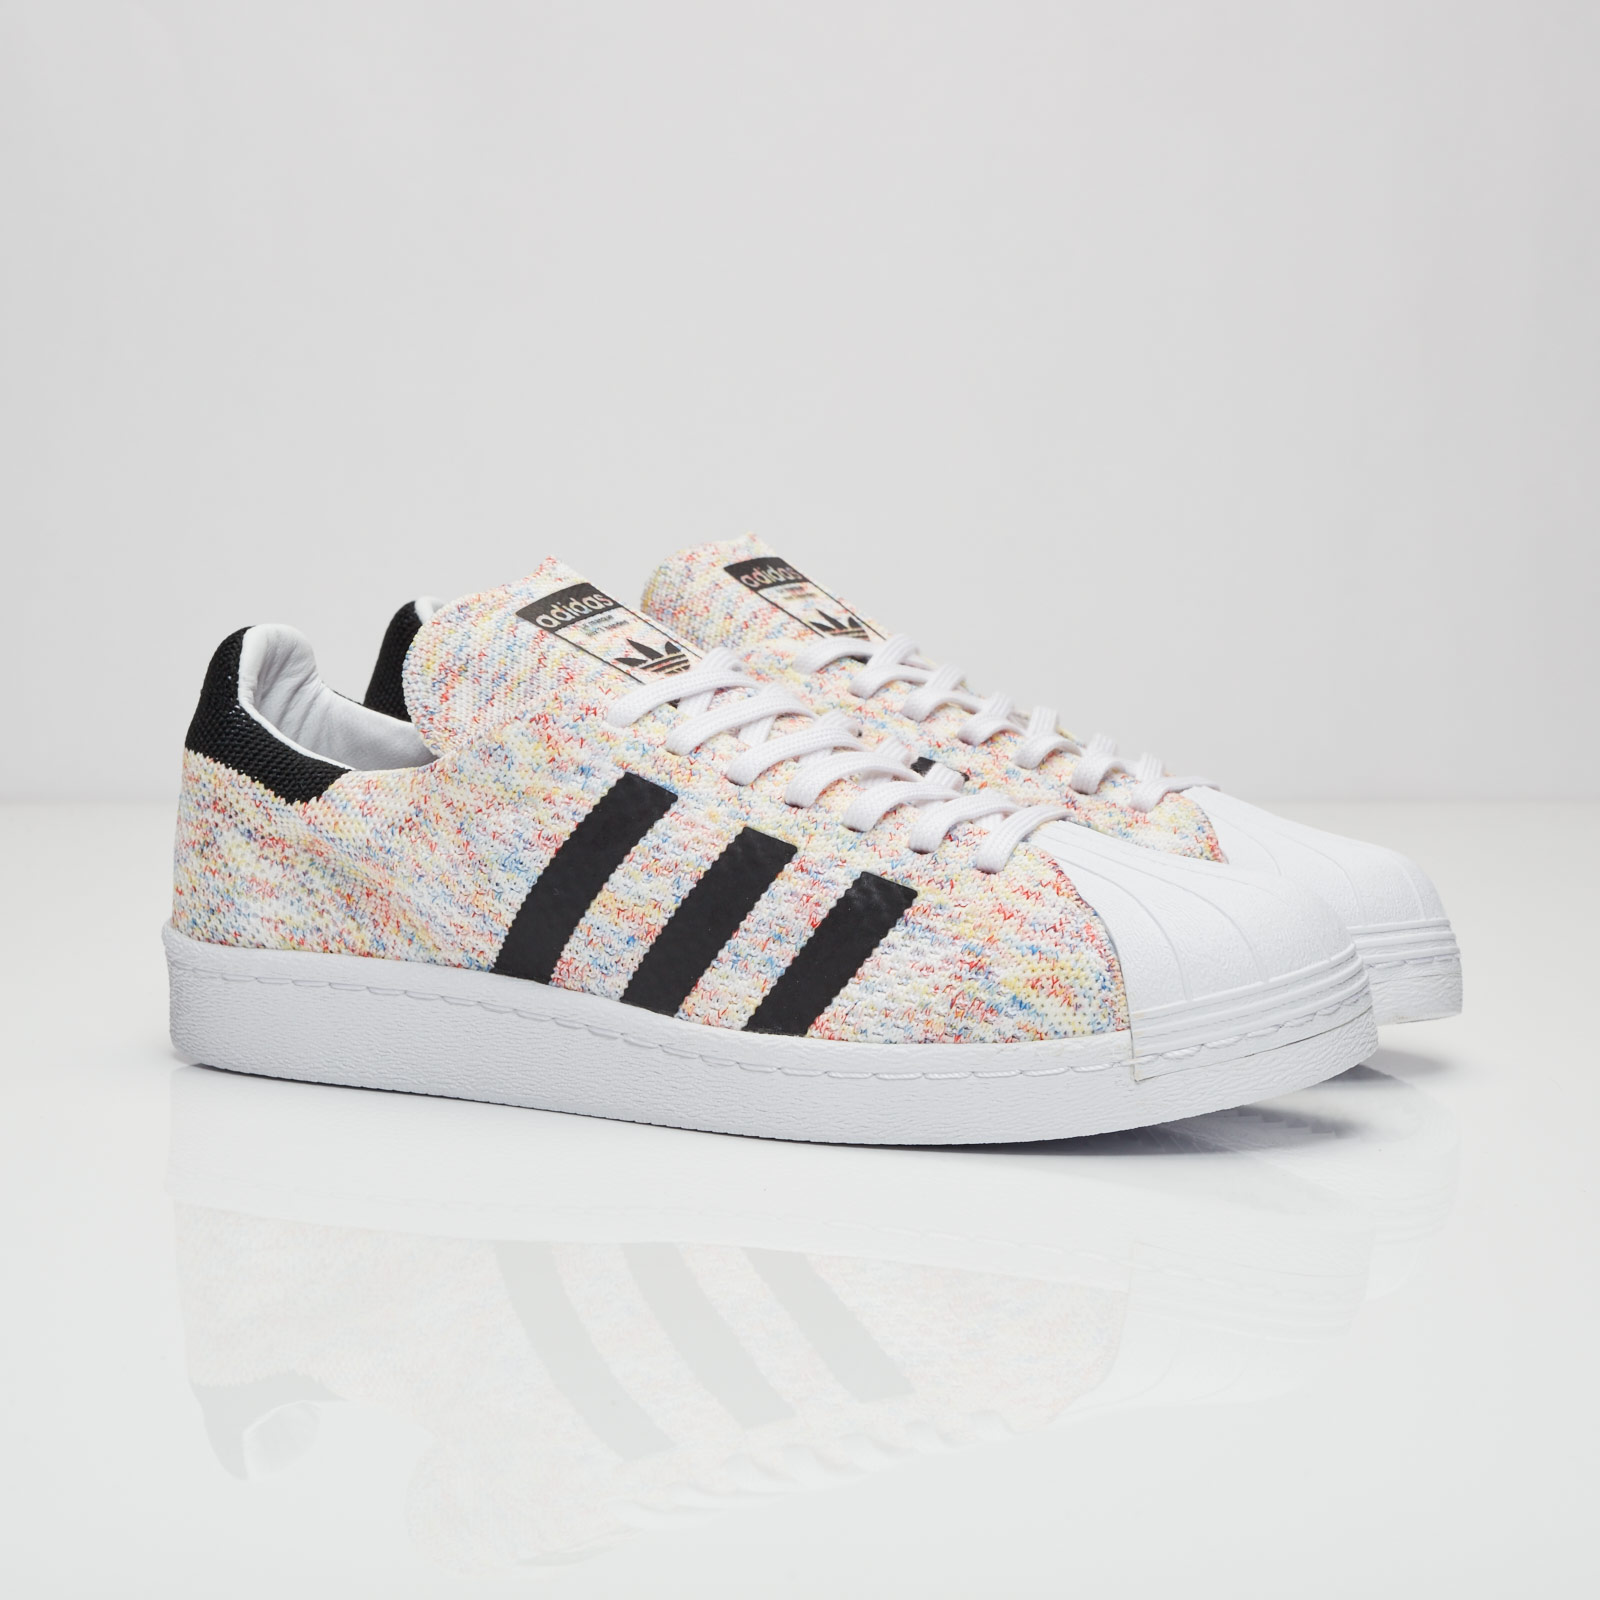 Adidas superstar 80s primeknit S75845